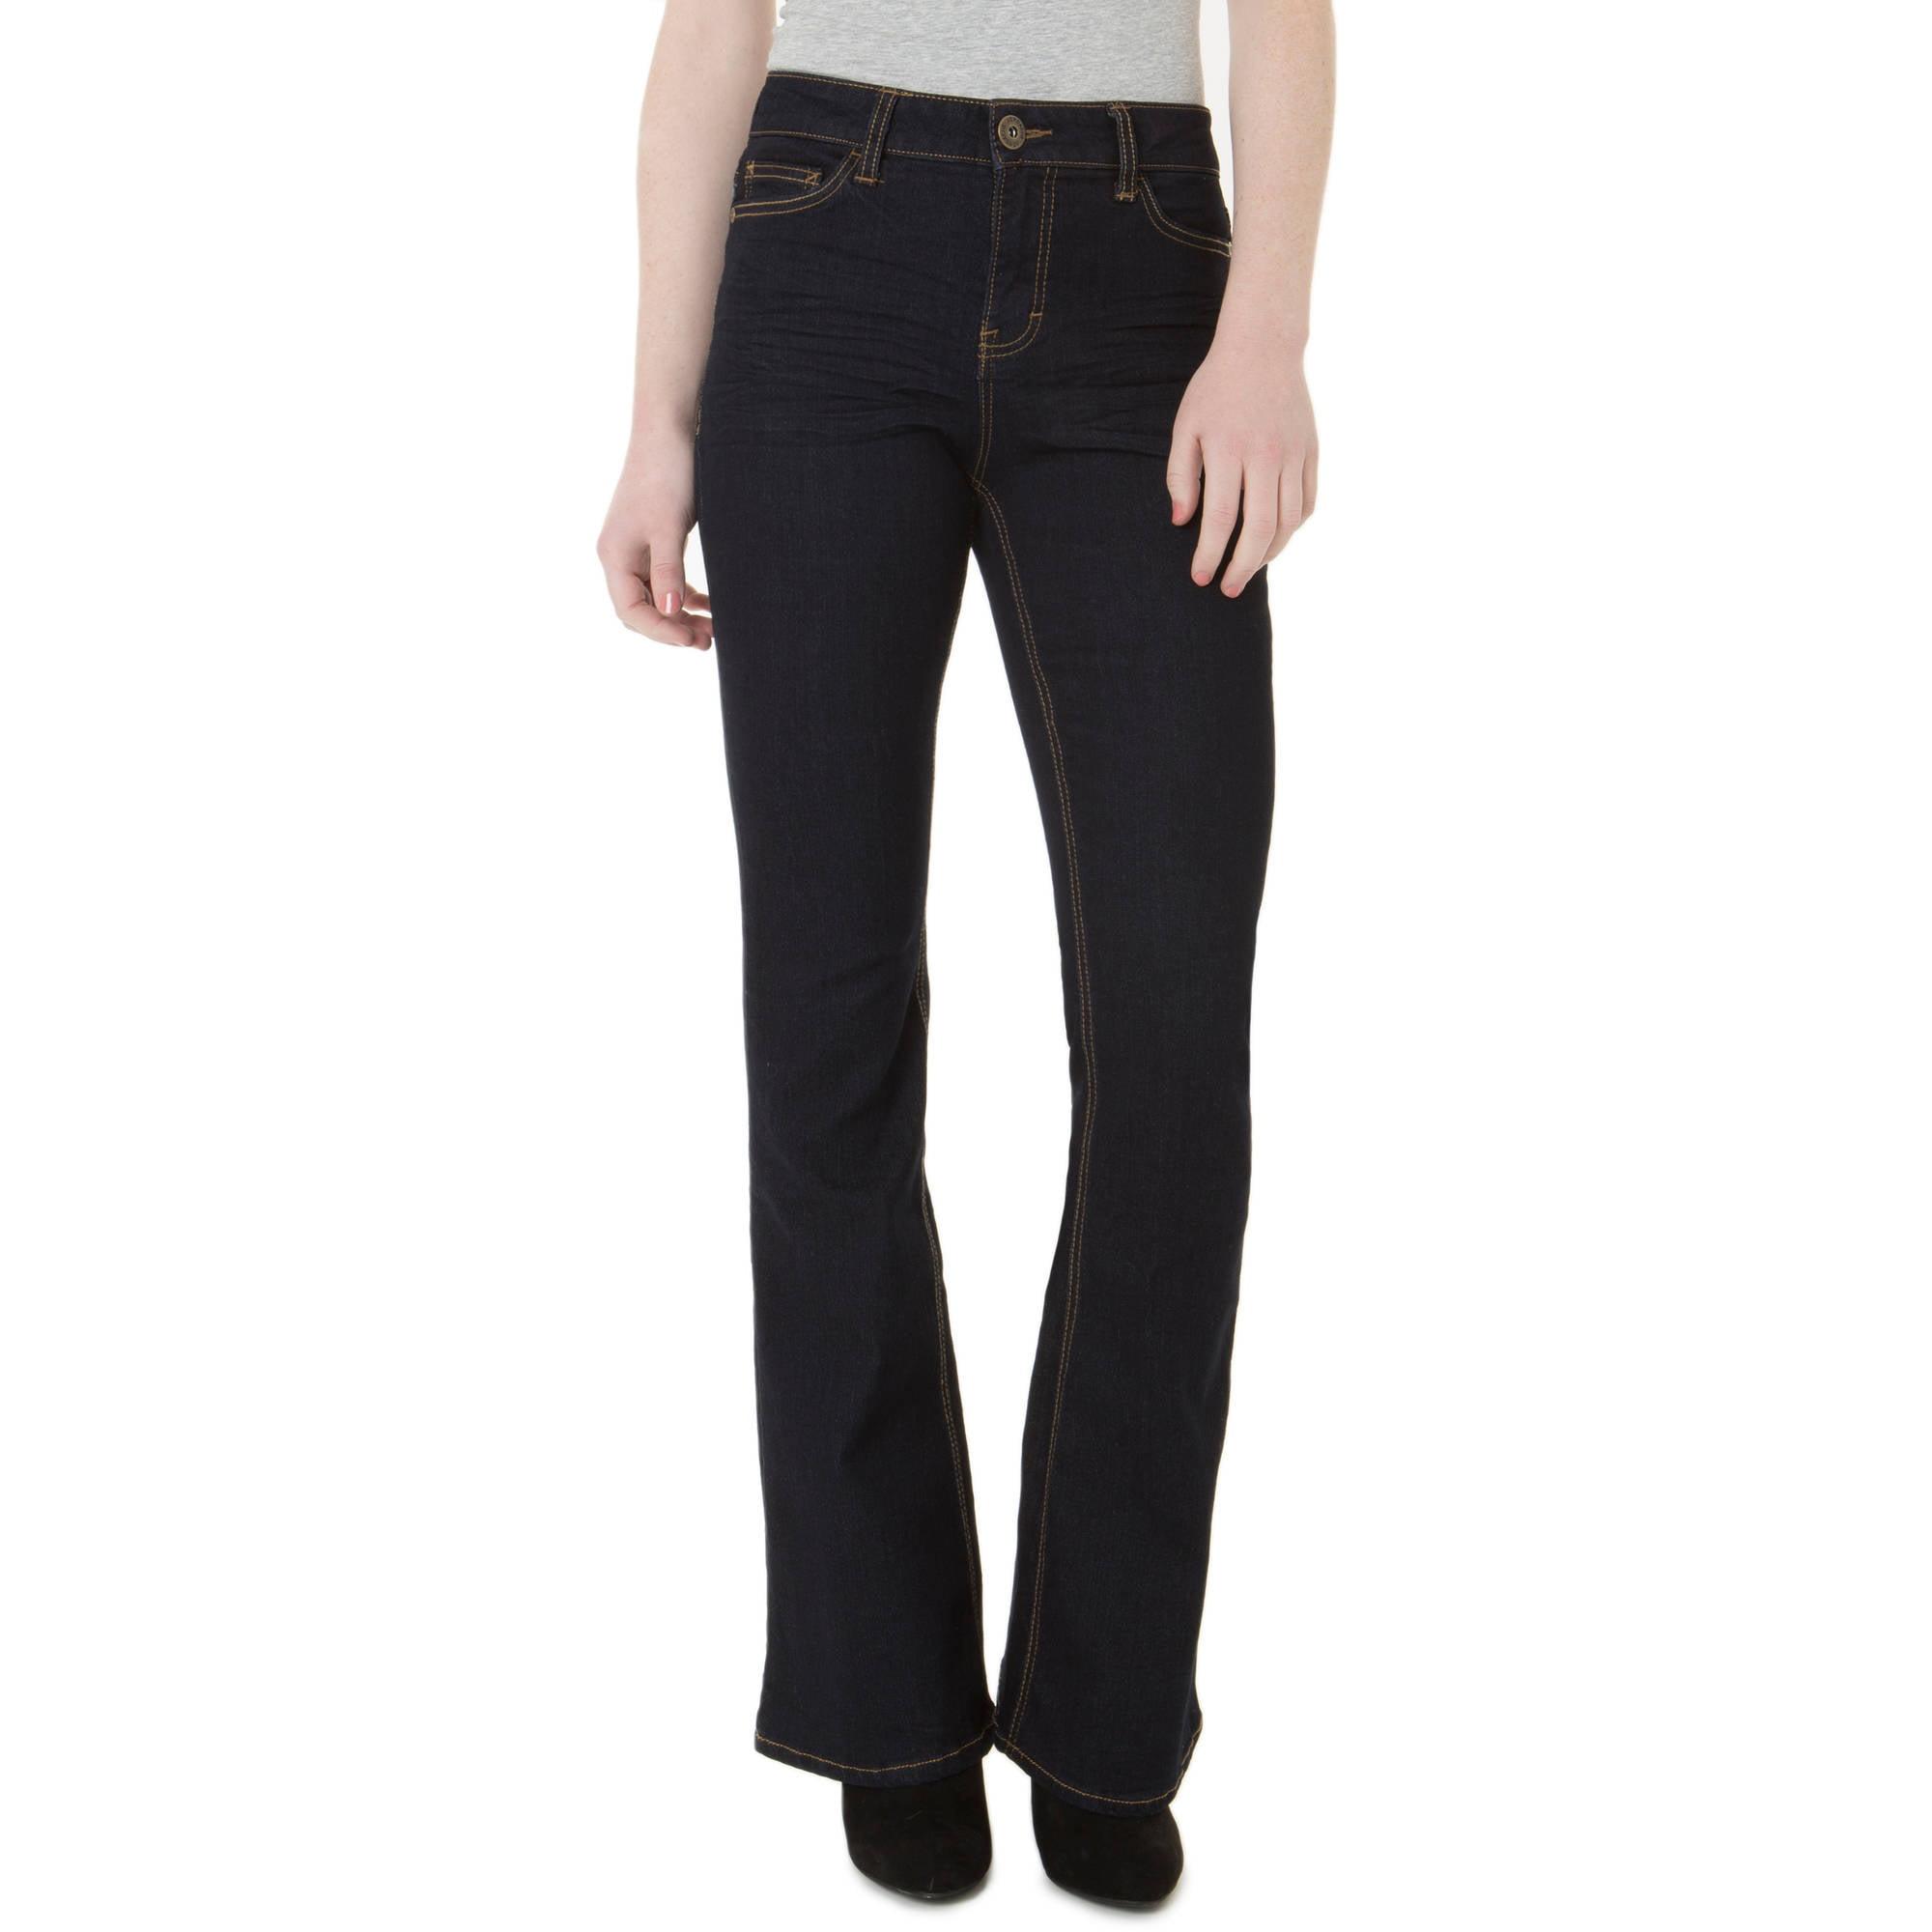 8eeb074eac37e Jordache - Women's Super Skinny Denim Jeggings, Availble in Regular and  Petite - Walmart.com